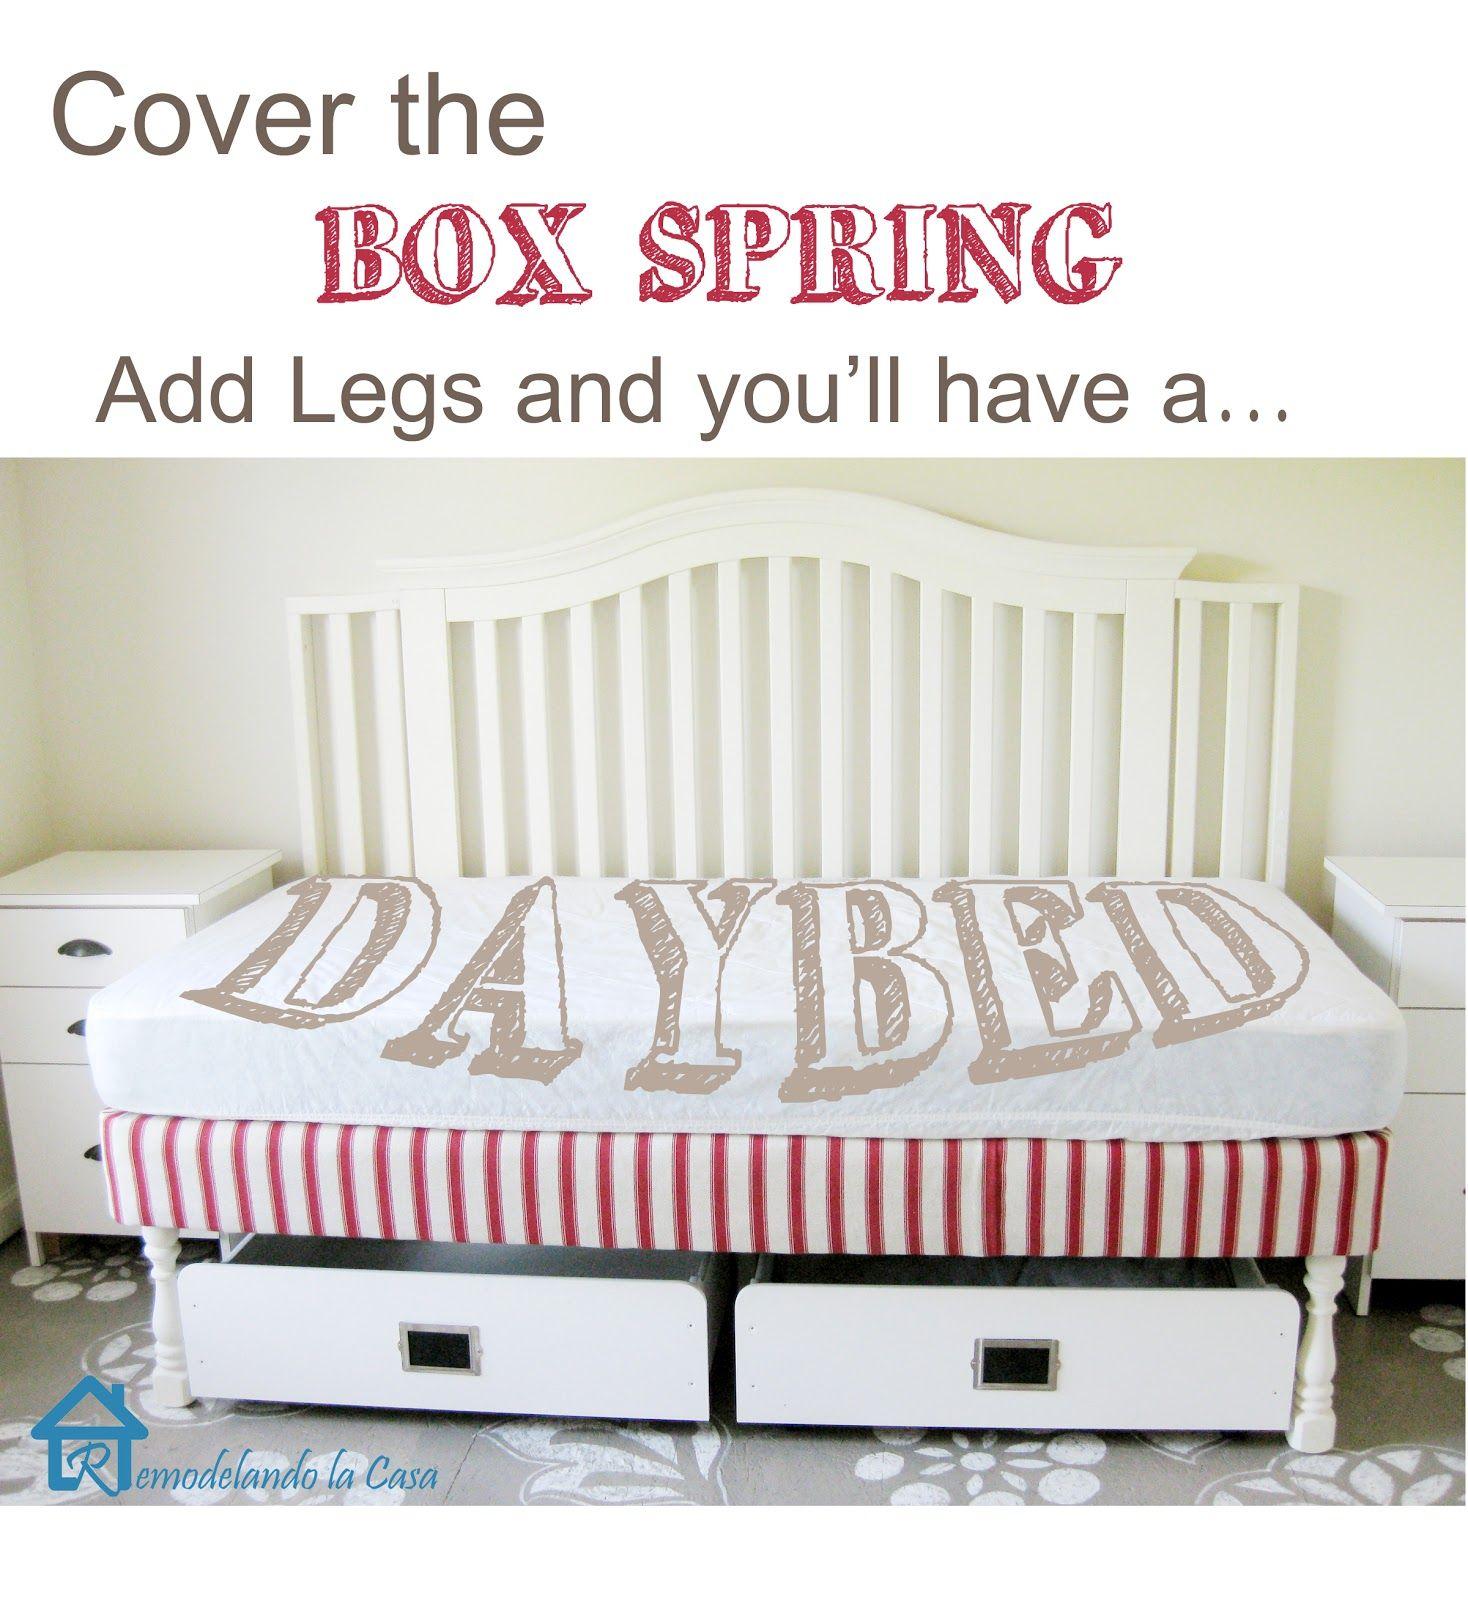 Remodelando La Casa Daybed From Box Spring Legs Diy Bed Frame